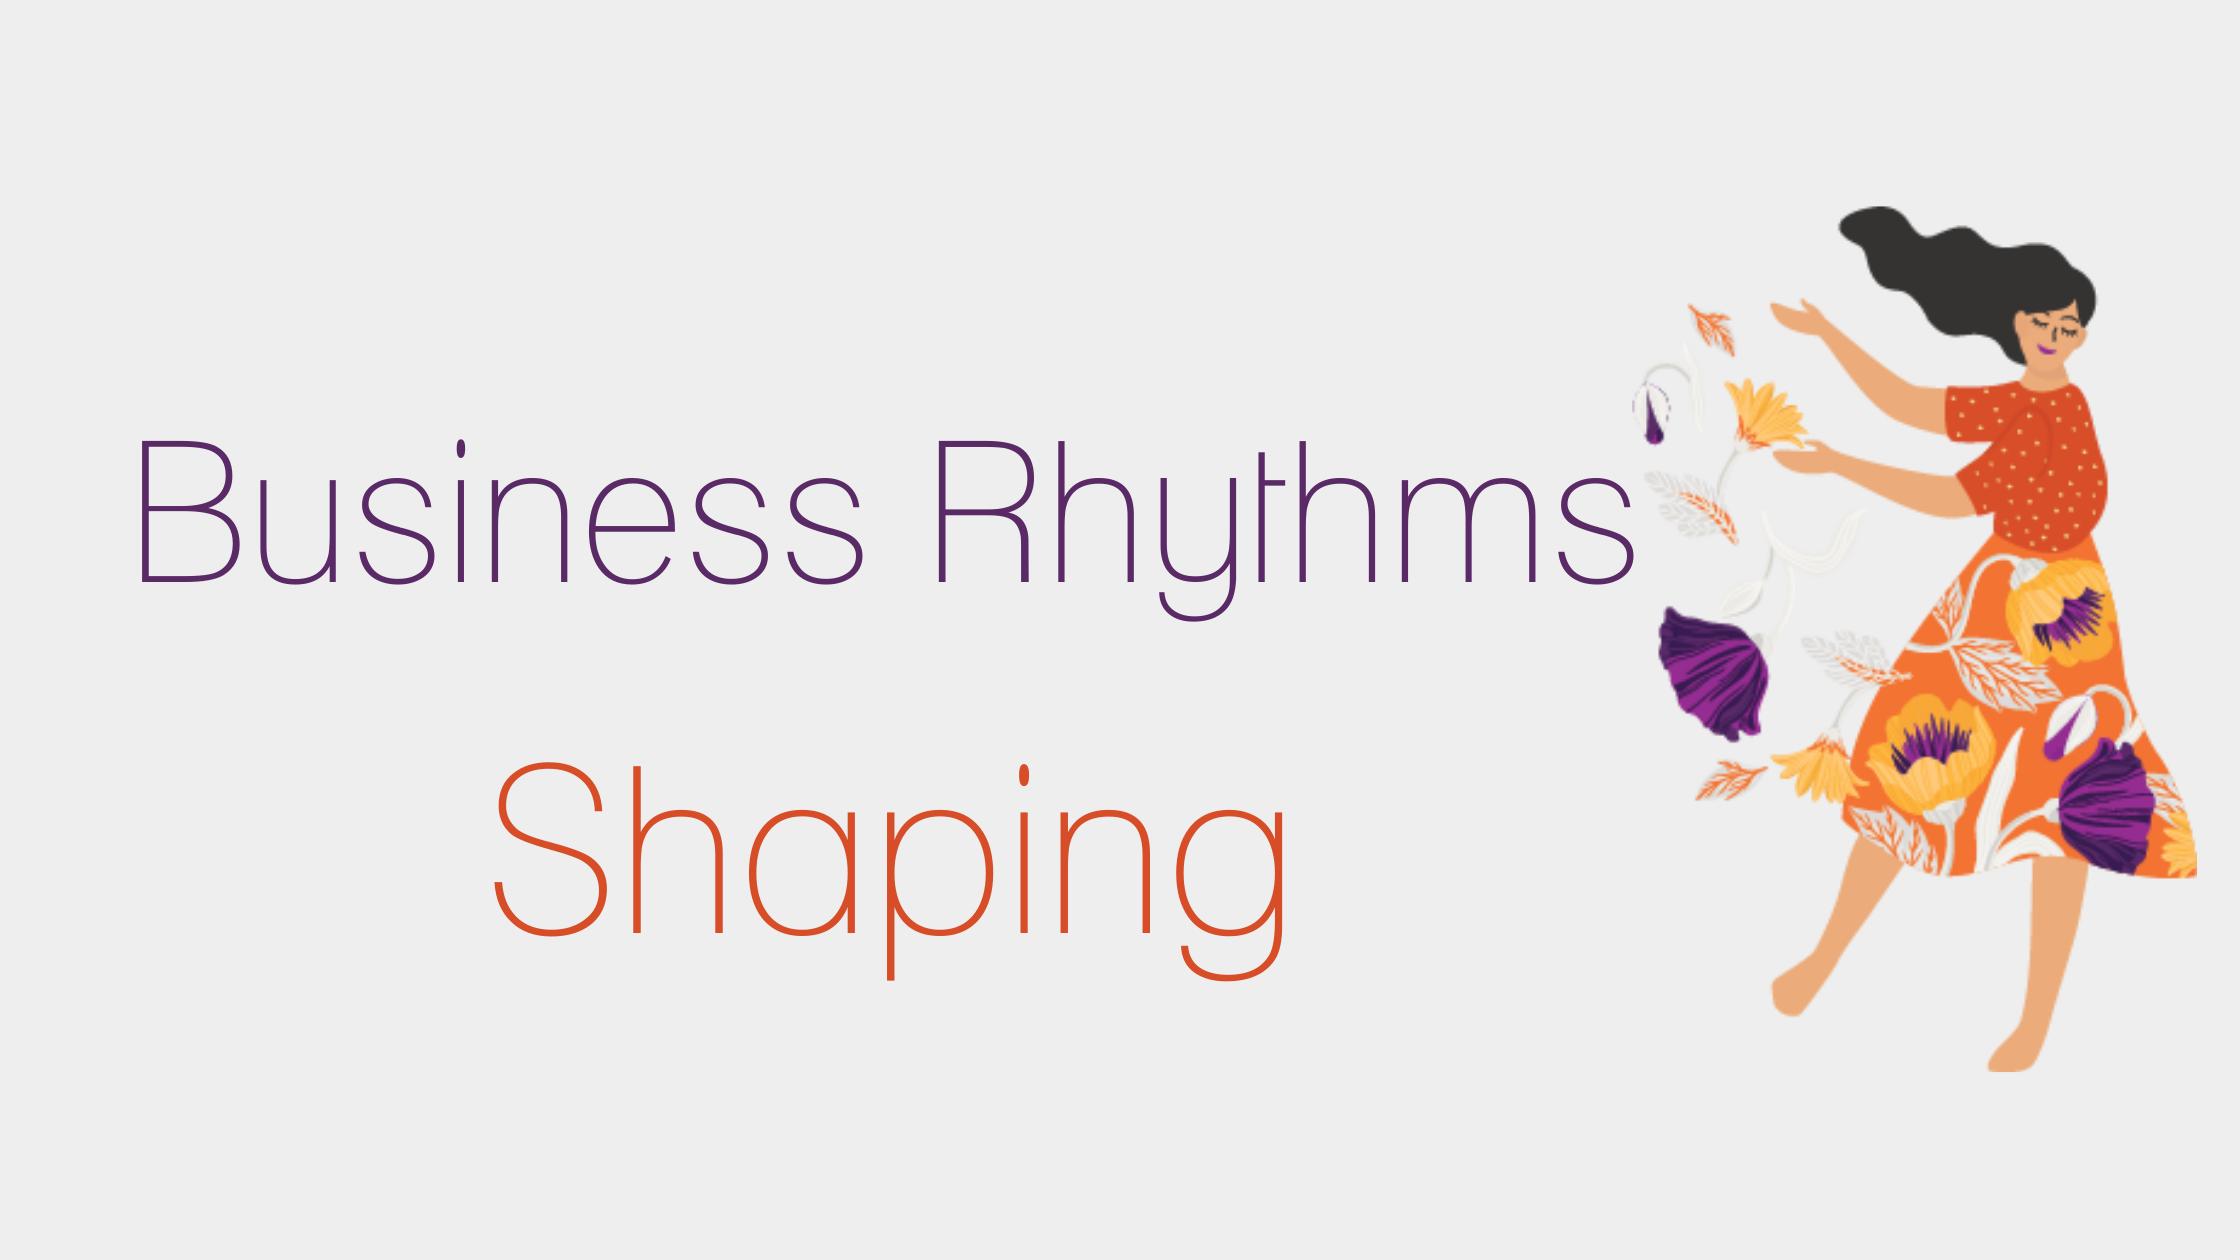 Business rhythms - shaping